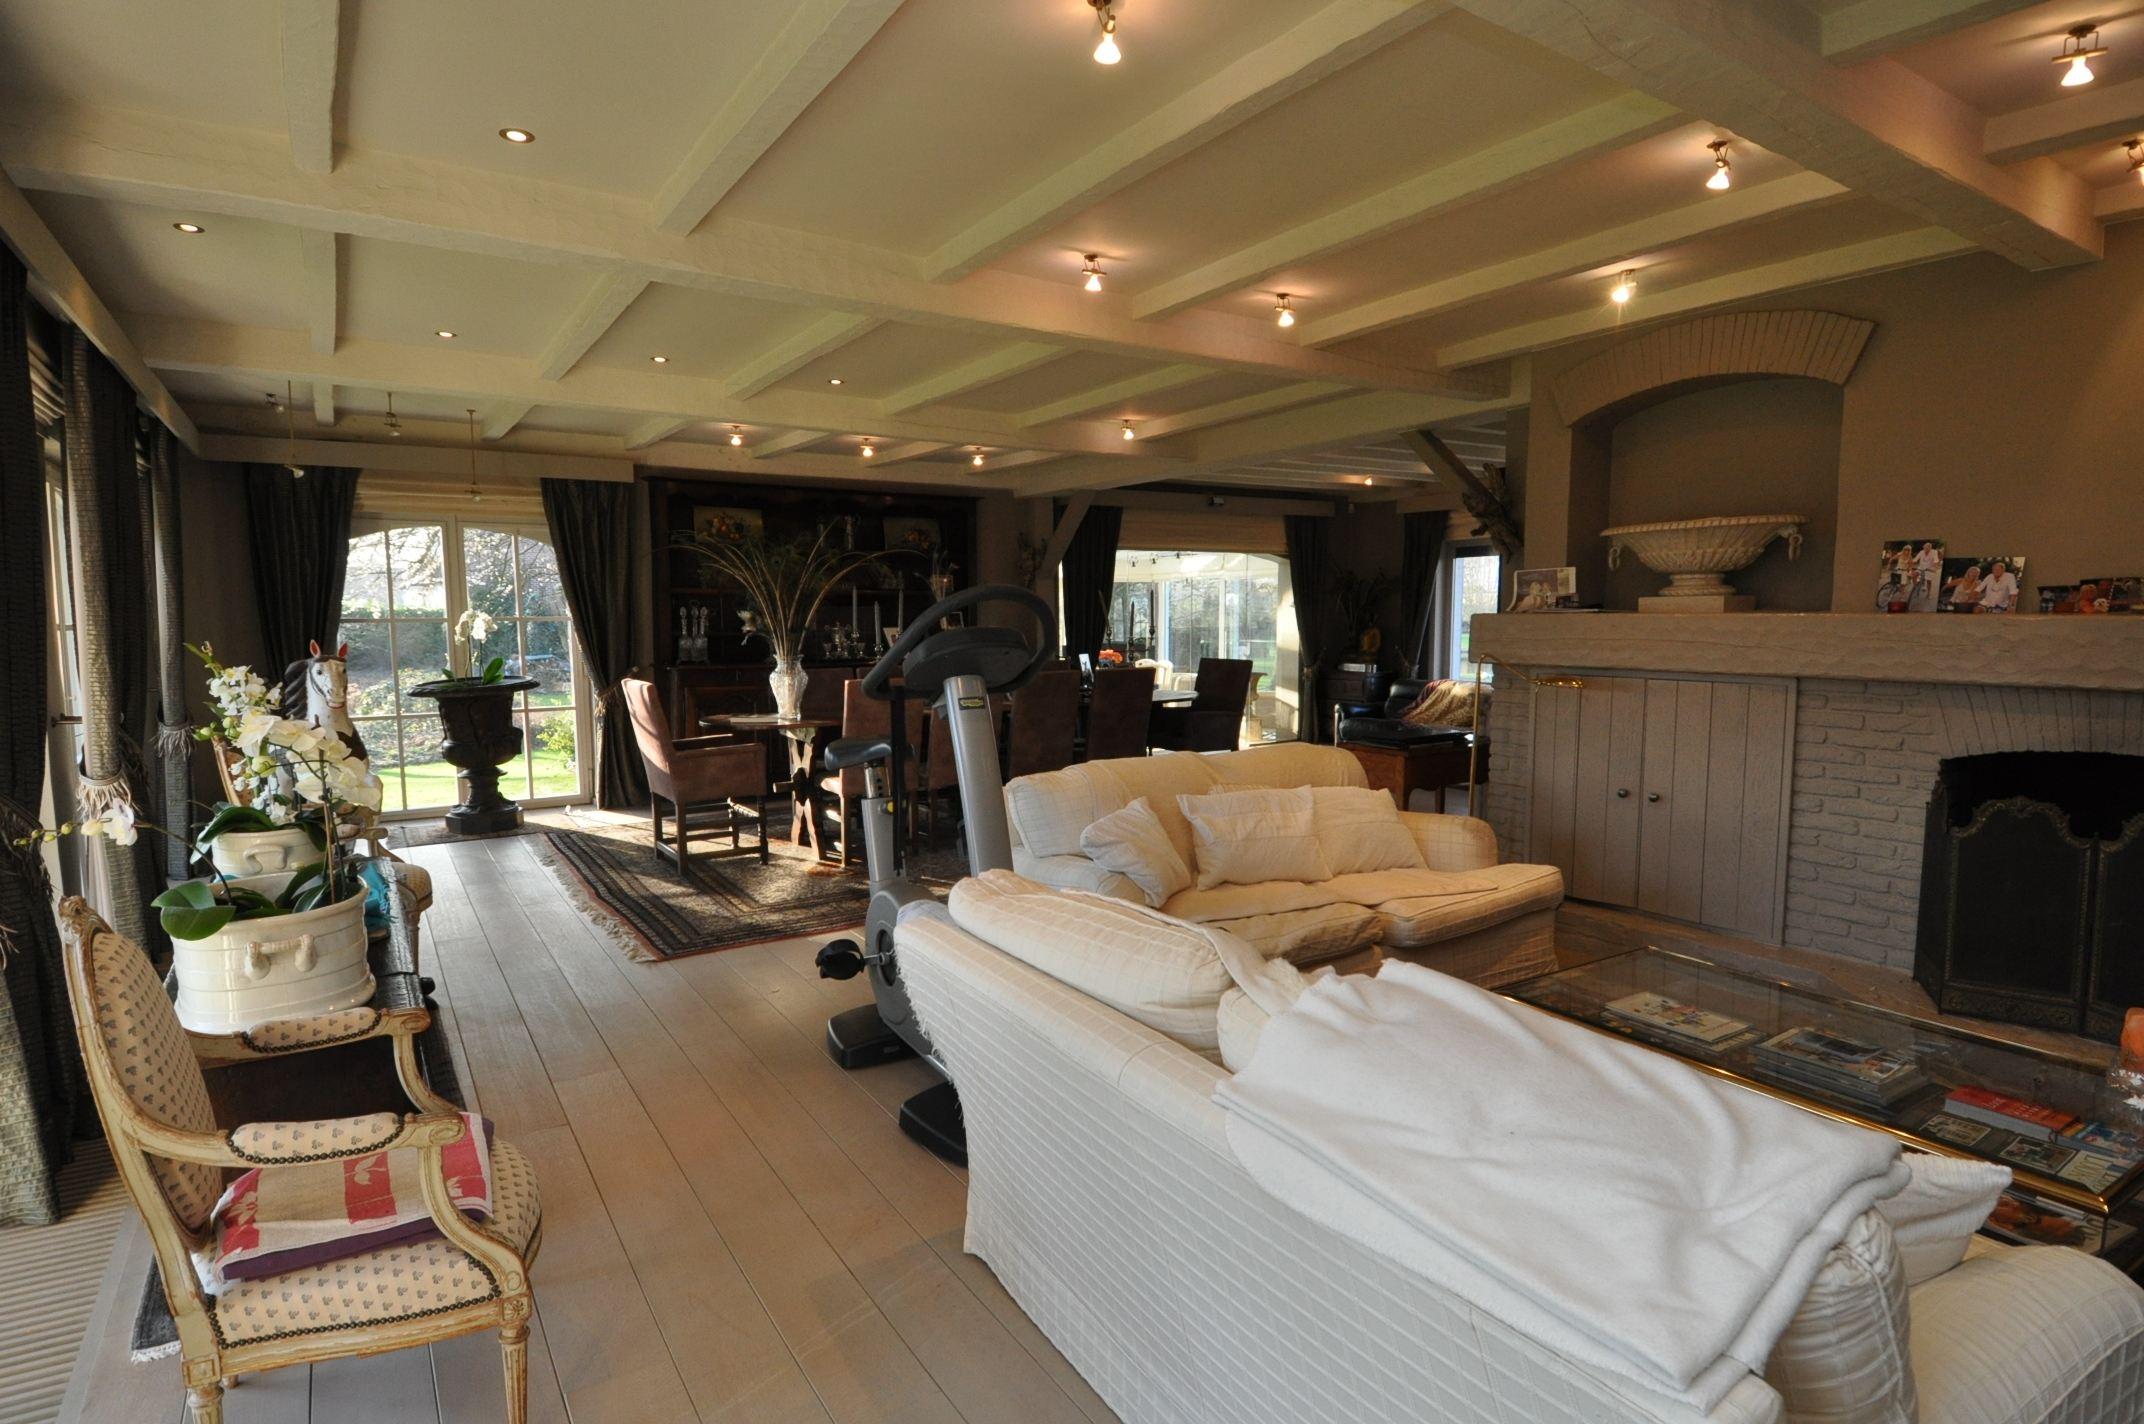 sales property at MENIN (B), 239sqm luxurious villa on a 2ha. plot